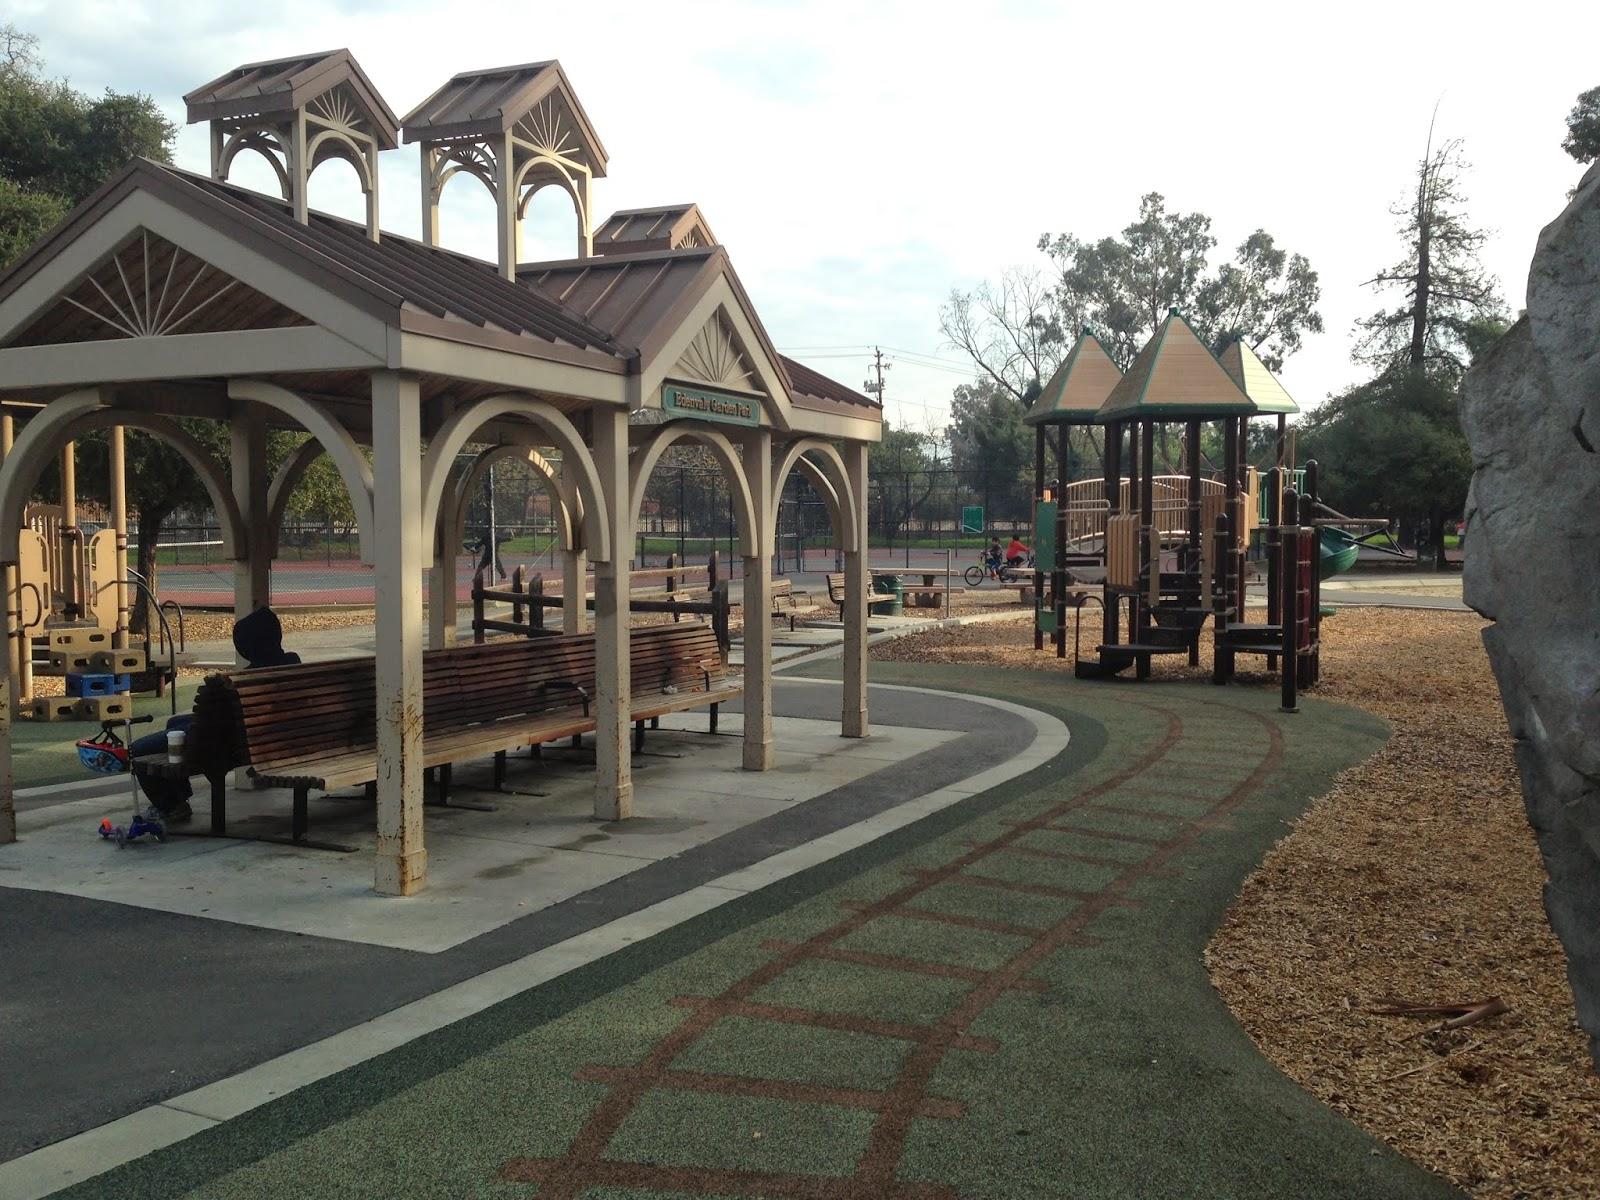 Playground Report: Edenvale Garden Park (South San Jose)